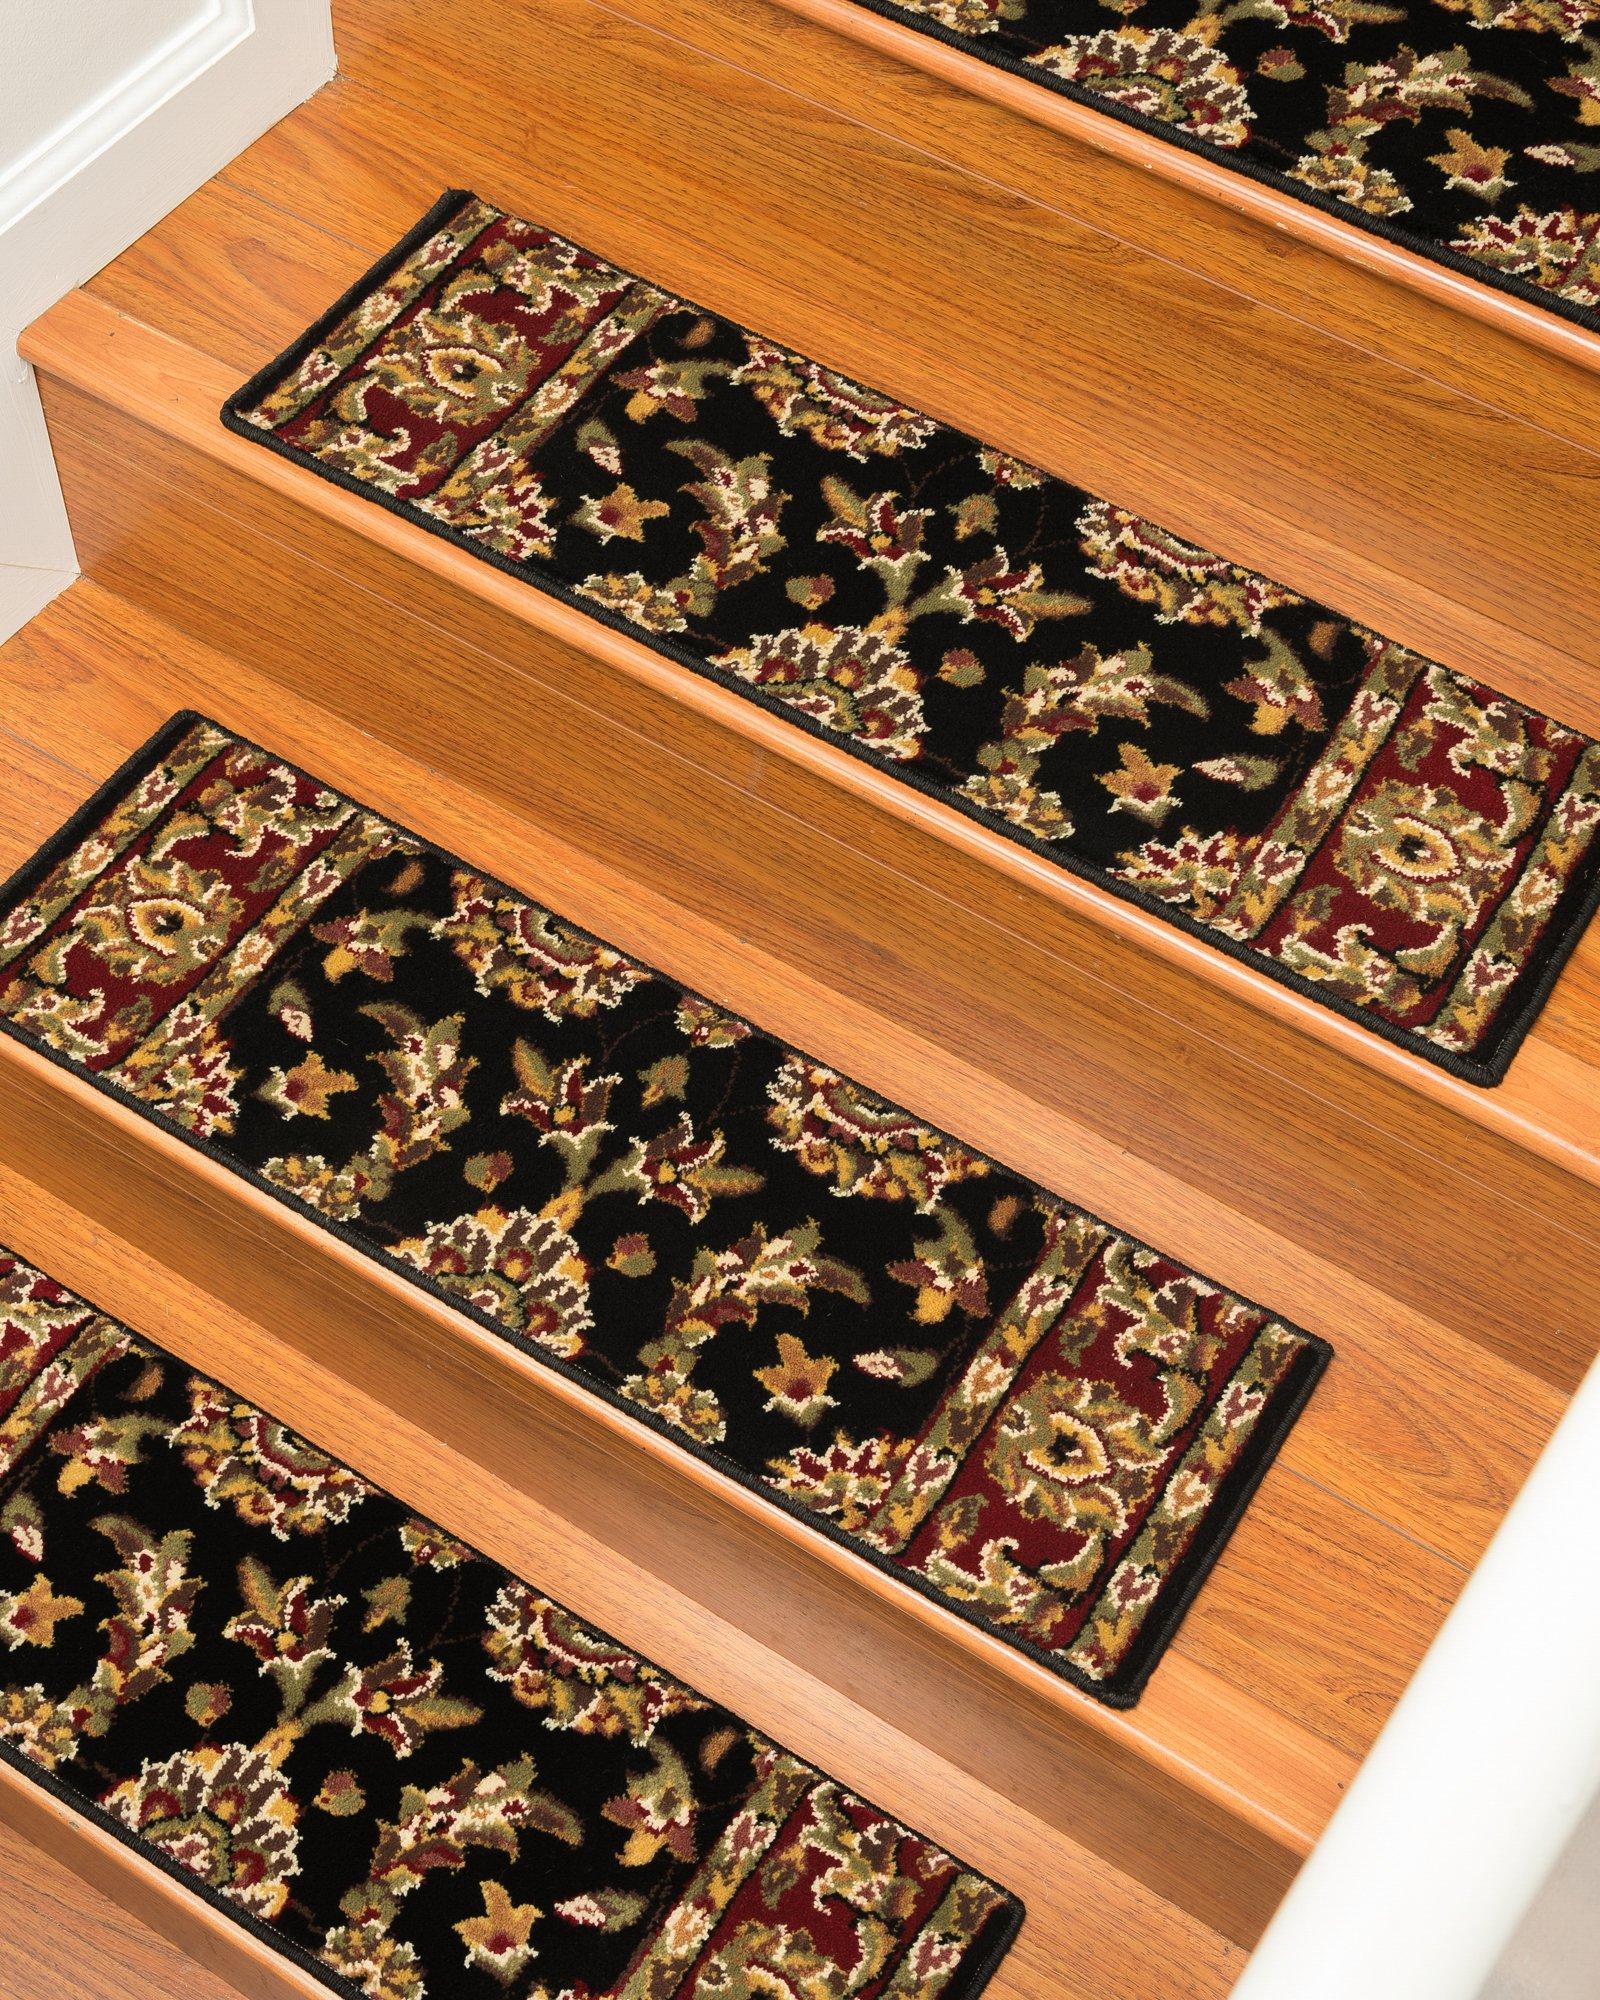 NaturalAreaRugs Sydney Carpet Stair Treads  Rug (Set of 13), 9 x 29'', Black by NaturalAreaRugs